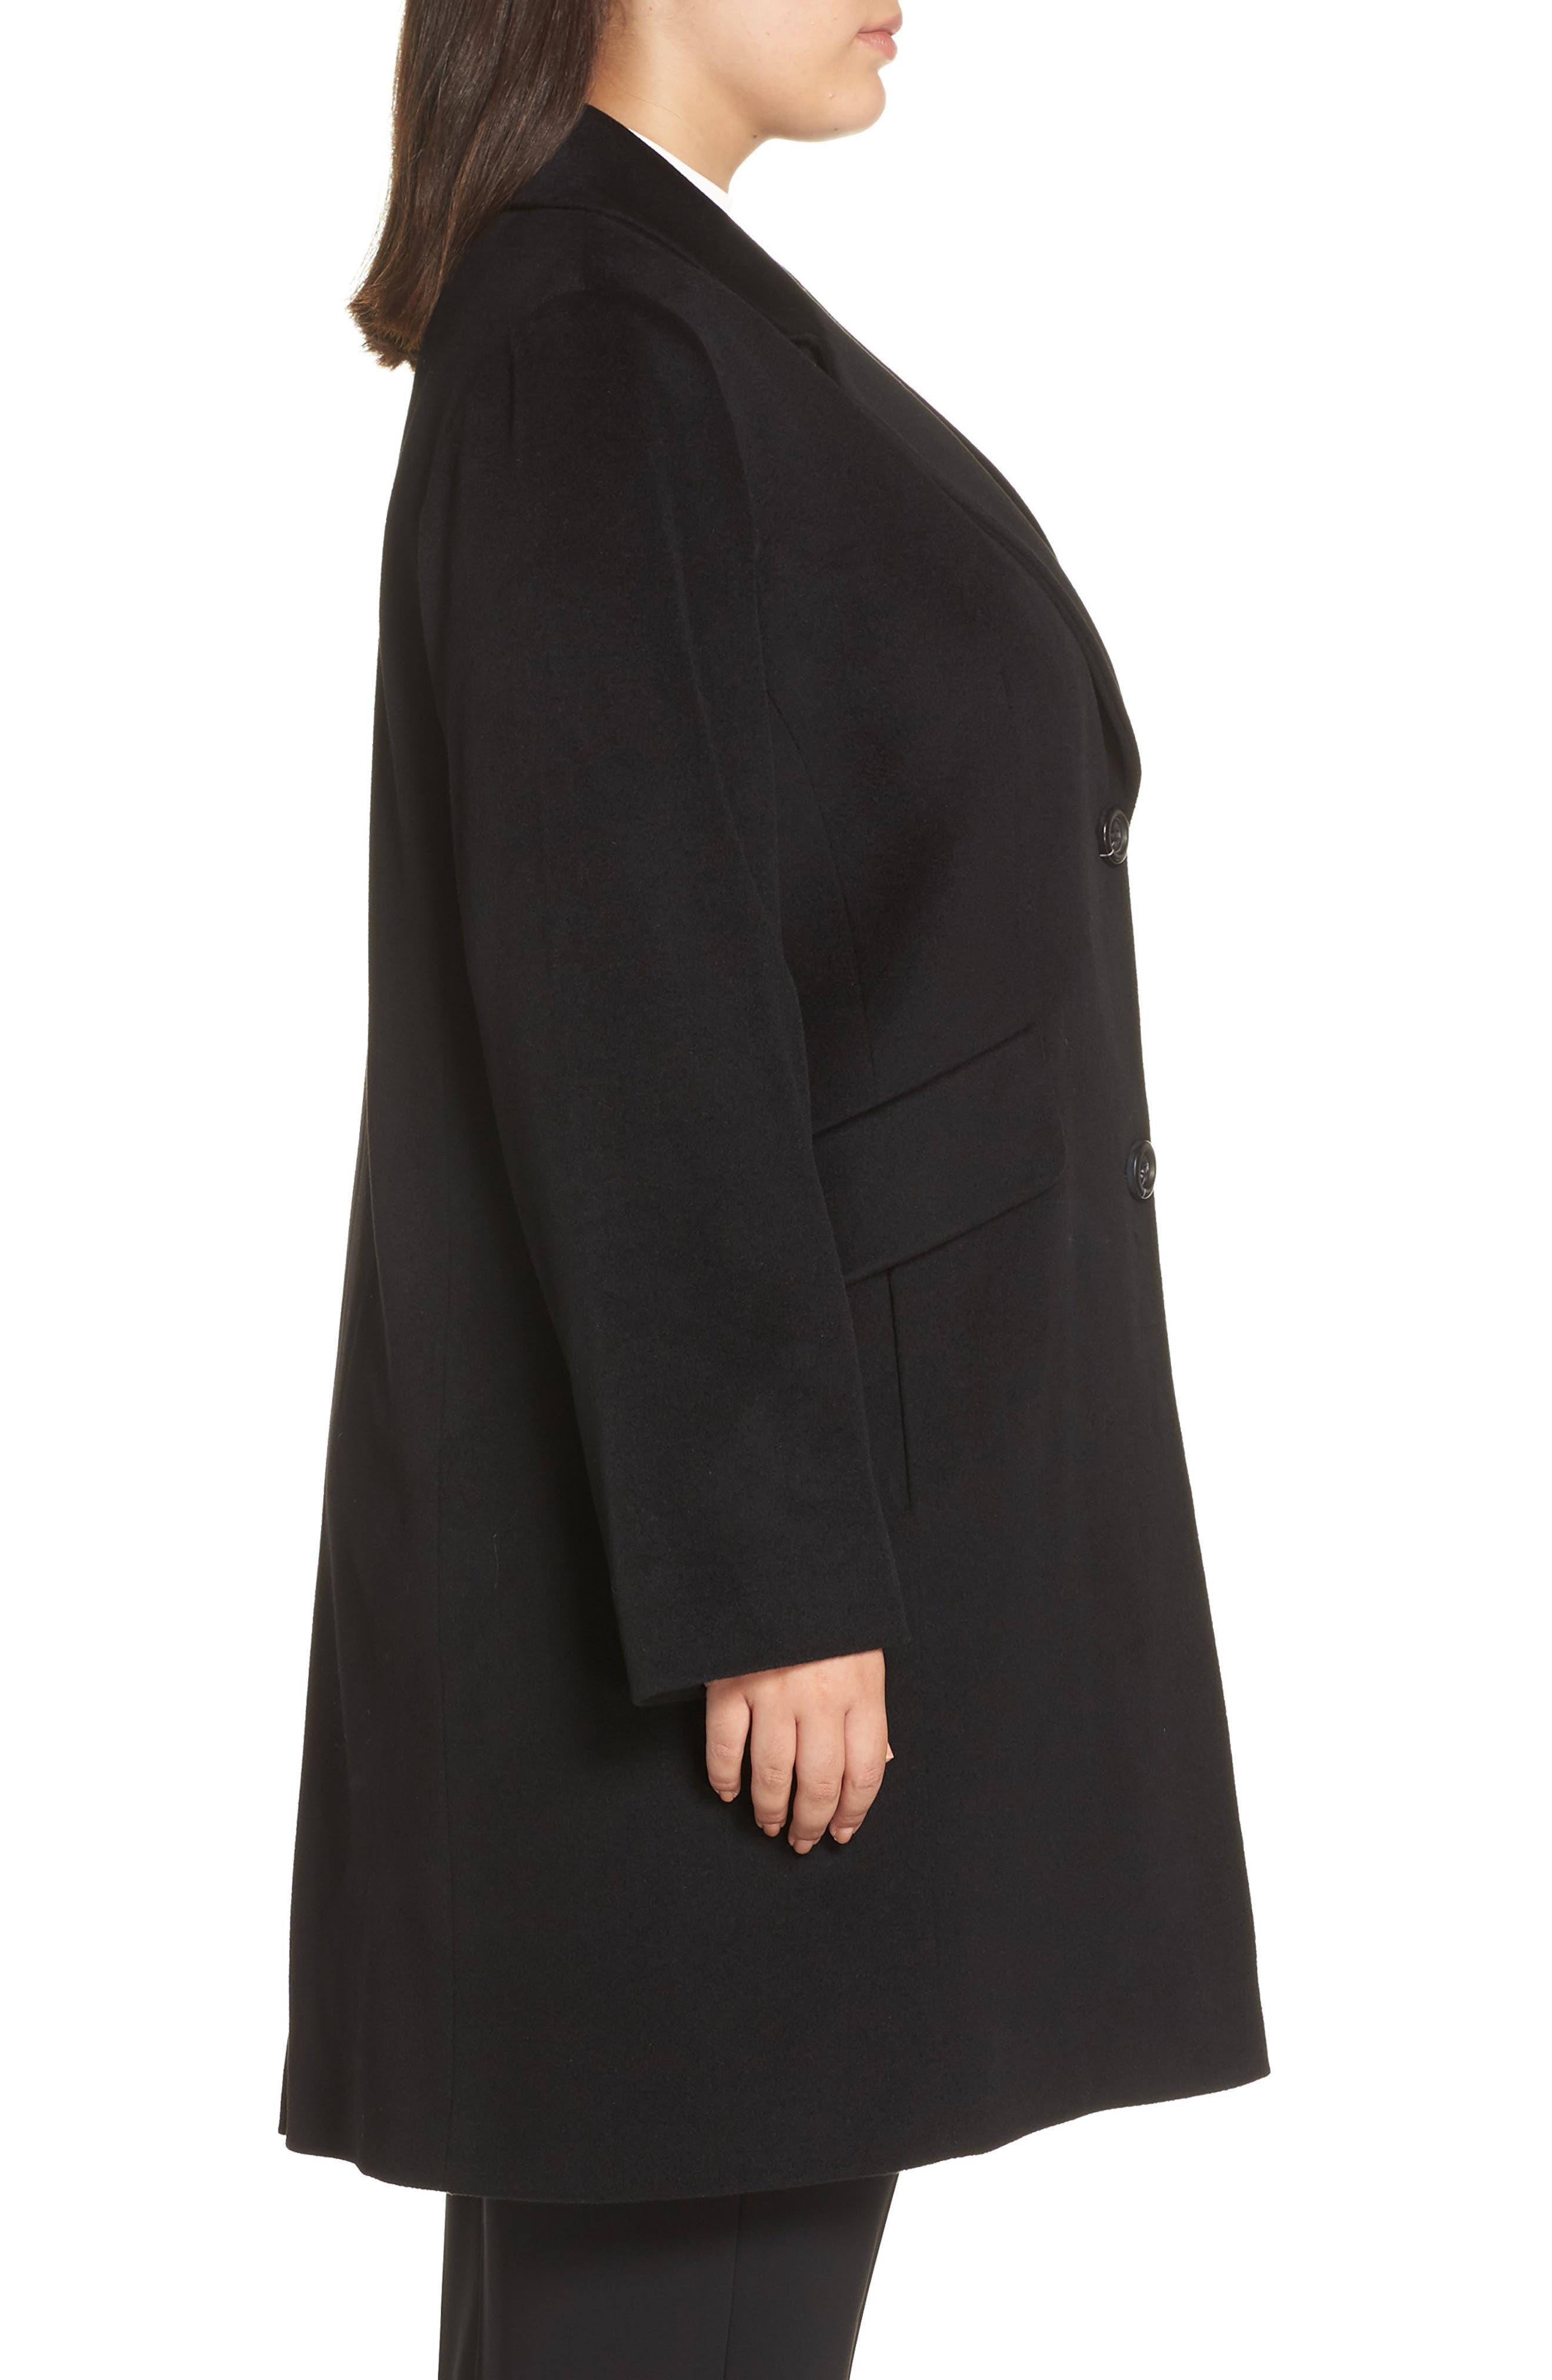 FLEURETTE,                             Notch Collar Loro Piana Wool Coat,                             Alternate thumbnail 3, color,                             BLACK